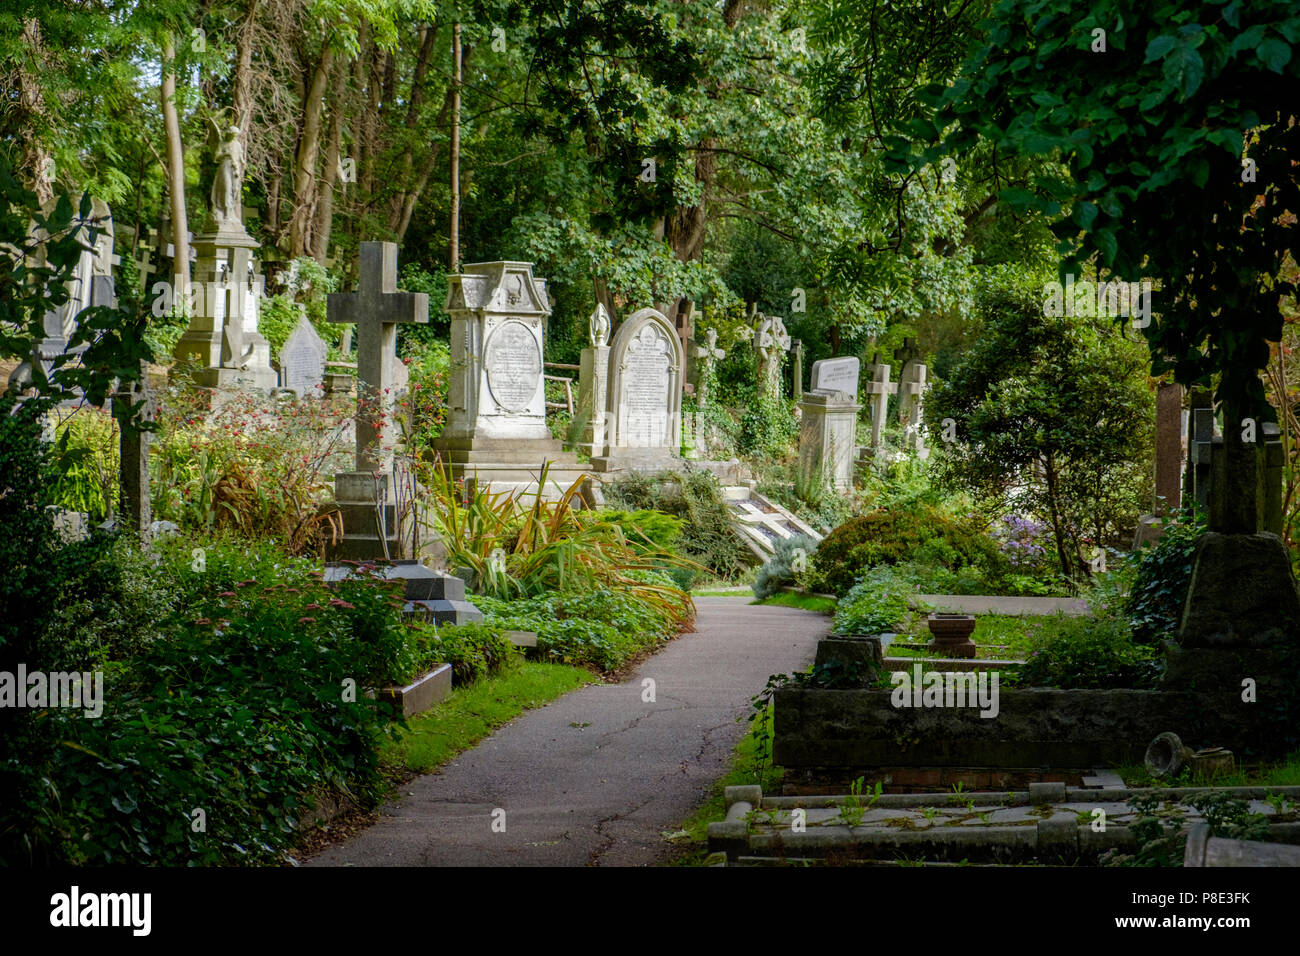 Highgate Cemetery, London. - Stock Image